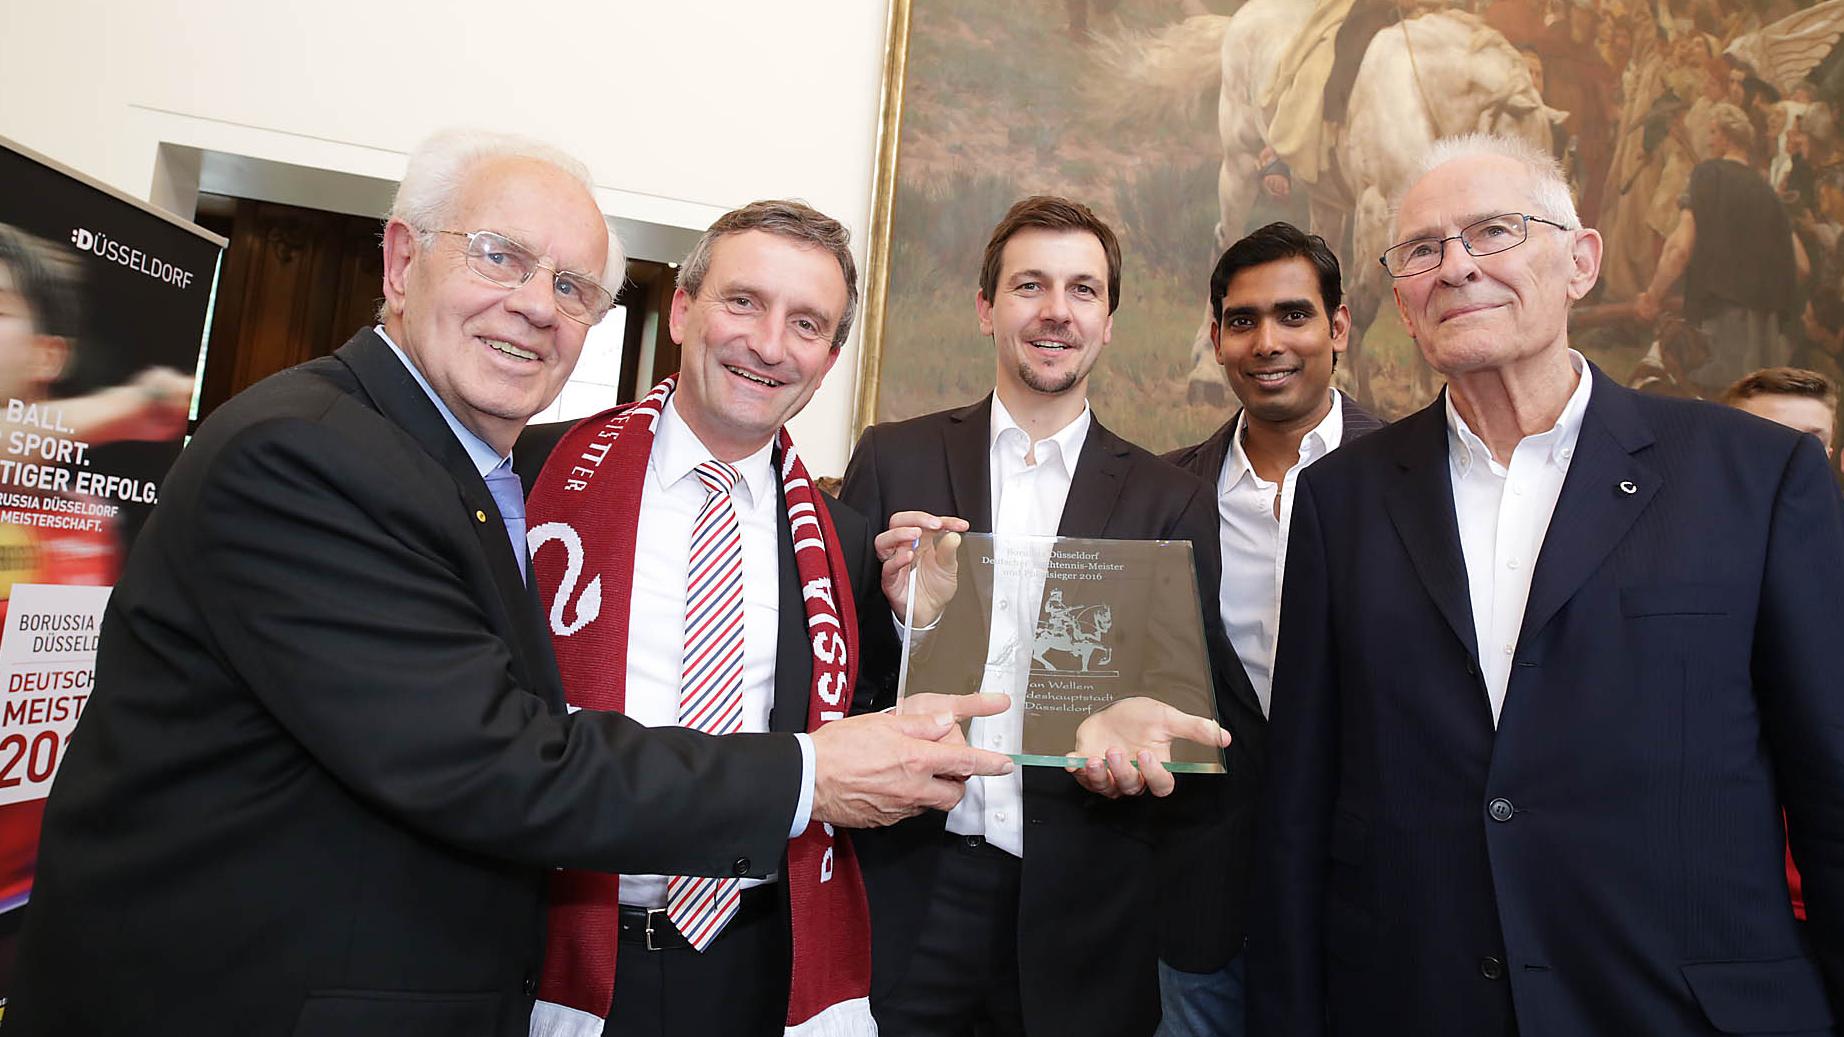 V.l.n.r.: Dr. Fritz Wienke, OB Thomas Geisel, Timo Boll, Kamal Achanta, Hans Wilhelm Gäb (Foto: Landeshauptstadt Düsseldorf/Ingo Lammert)